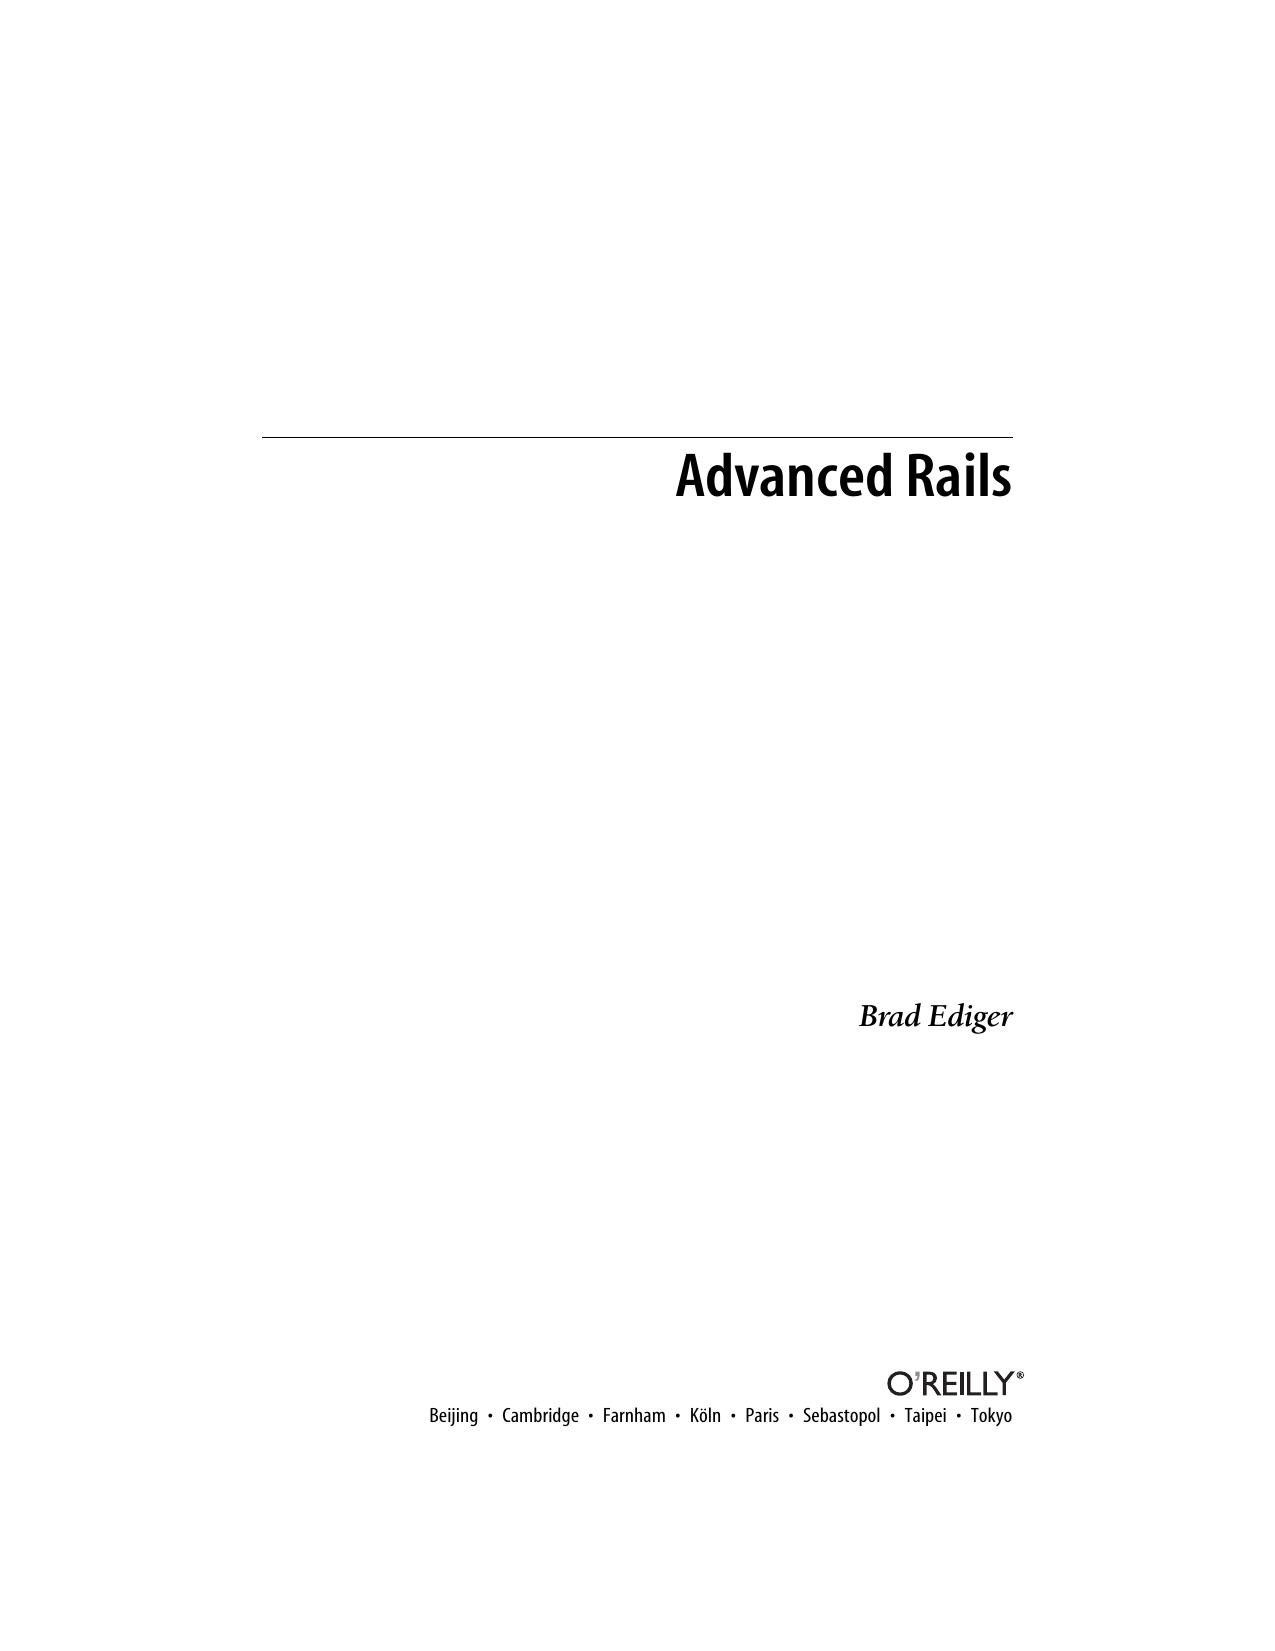 Advanced Rails | manualzz com